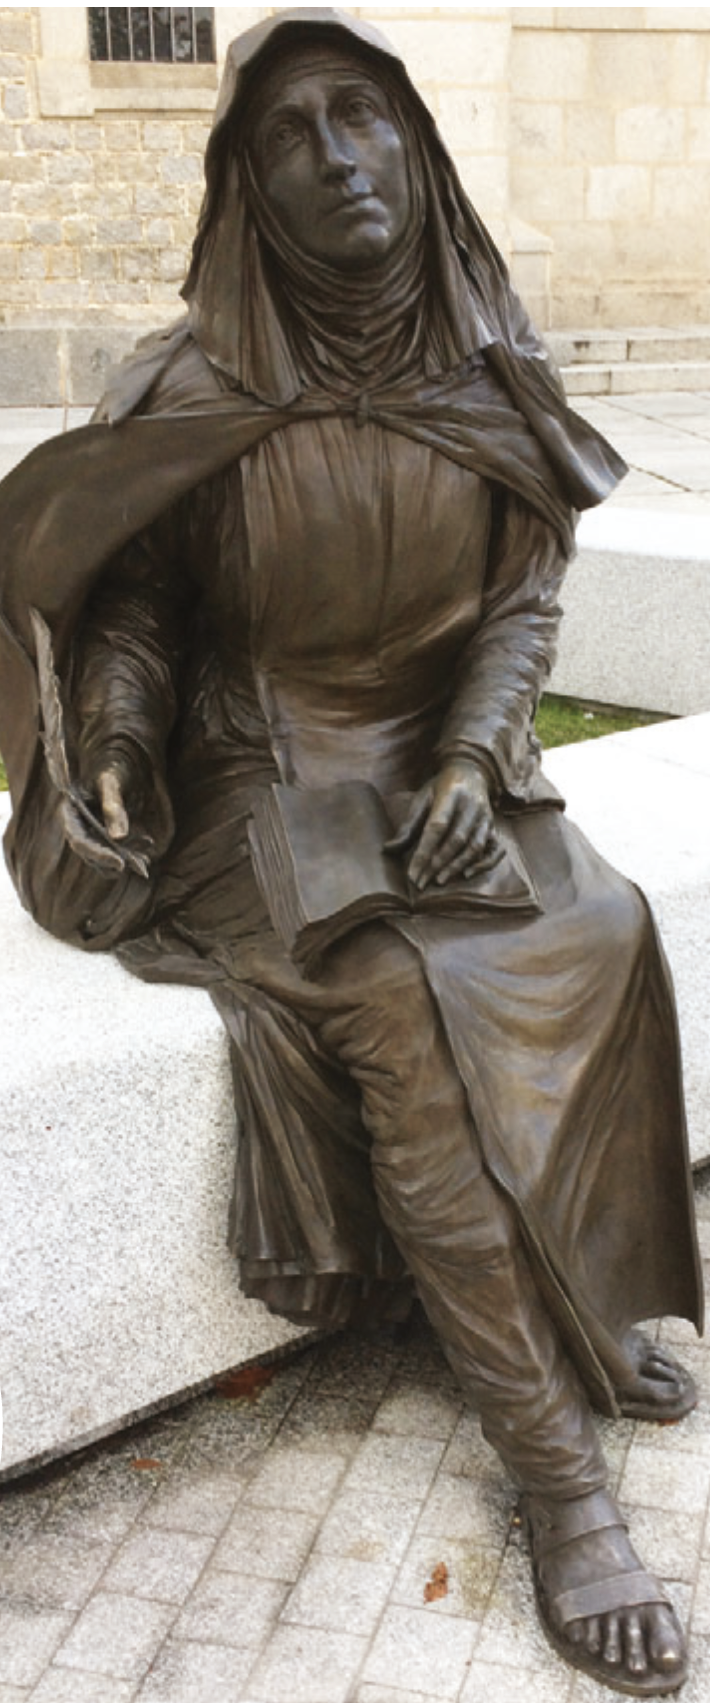 St Teresa of Ávila (Photo courtesy of The Tablet)